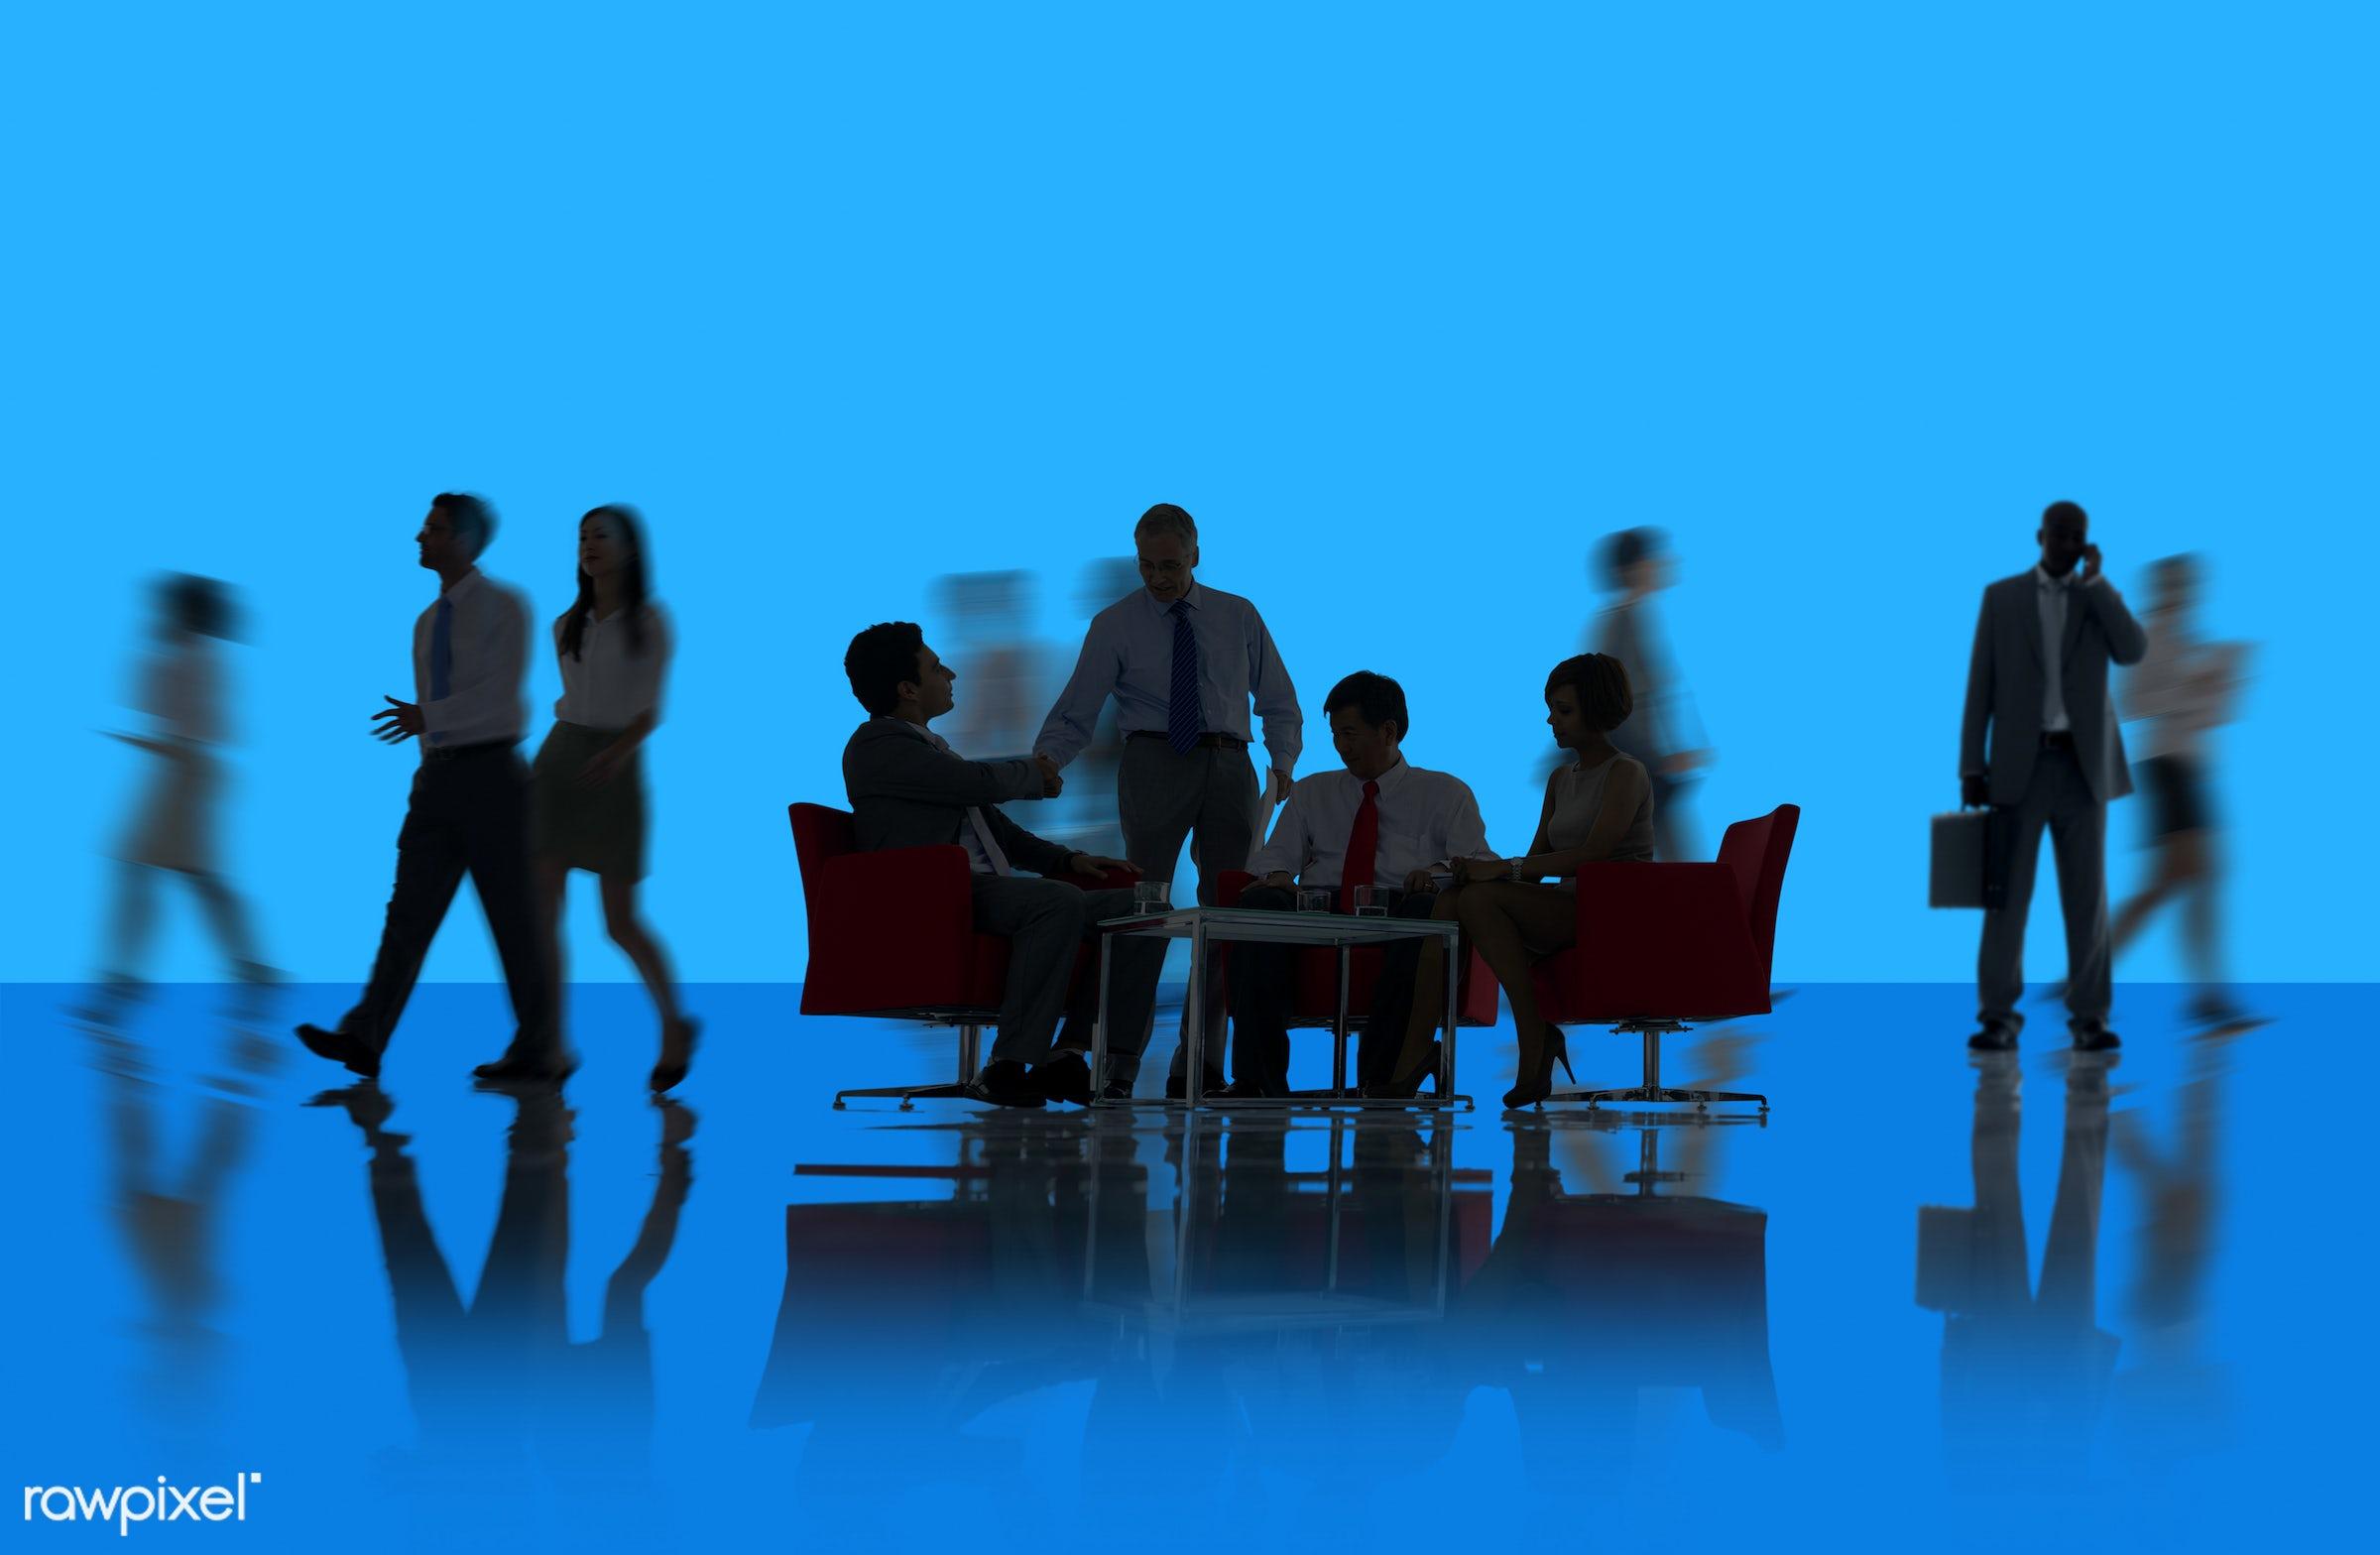 agreement, backdrop, background, backlit, blue, brainstorming, business, business people, businessmen, businesswomen, busy,...